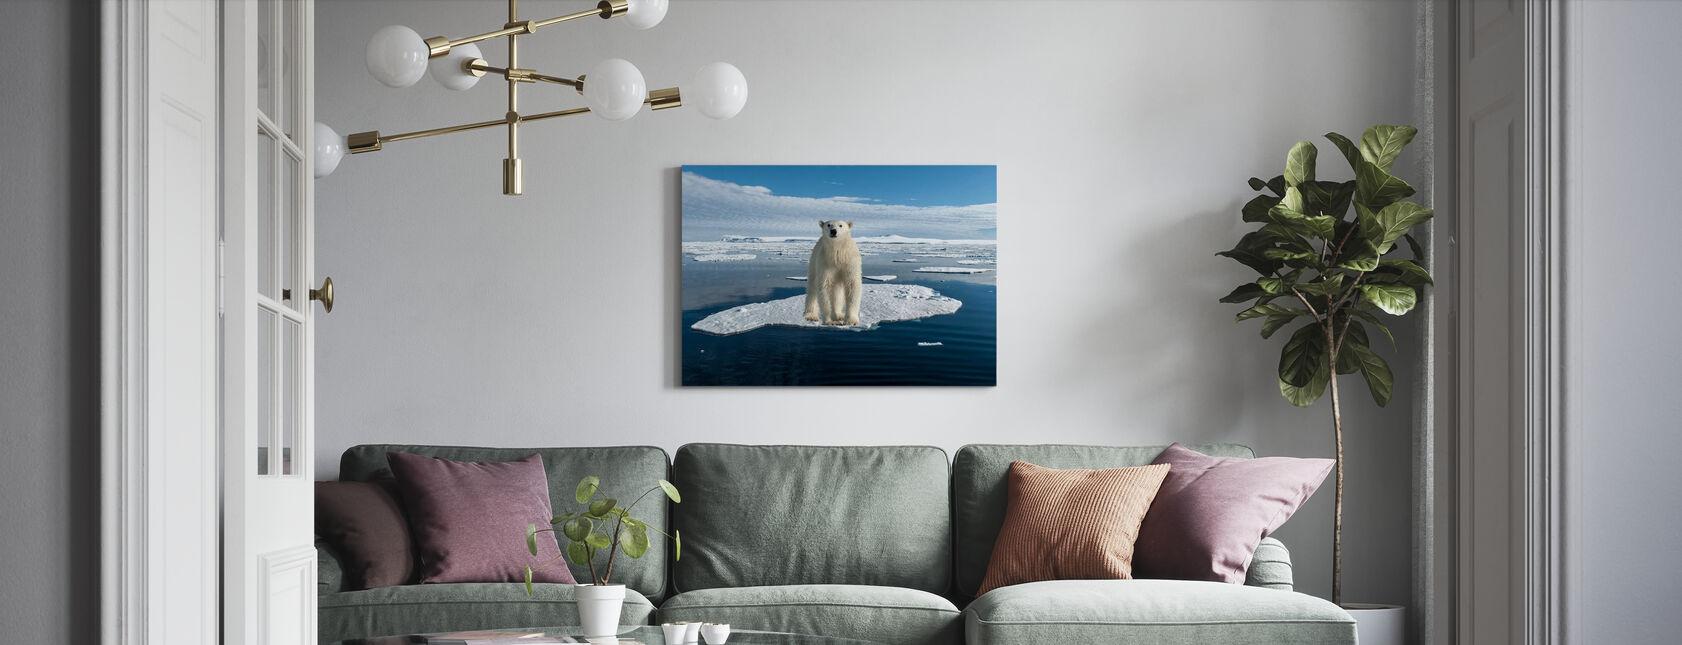 På tunn is - Canvastavla - Vardagsrum